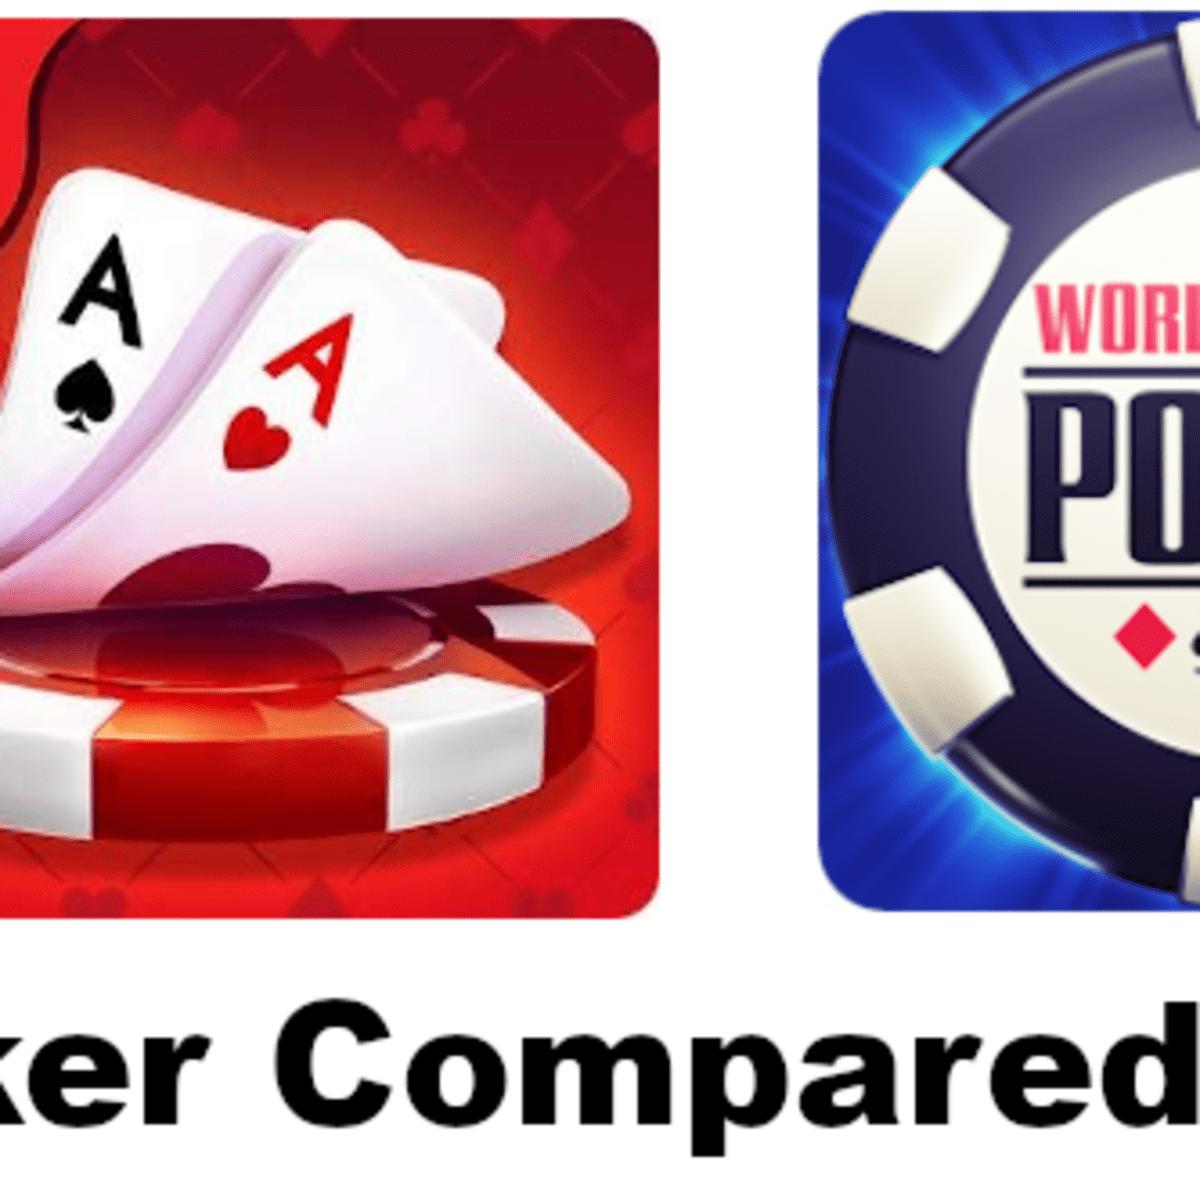 Zynga Poker Compared To Wsop Levelskip Video Games